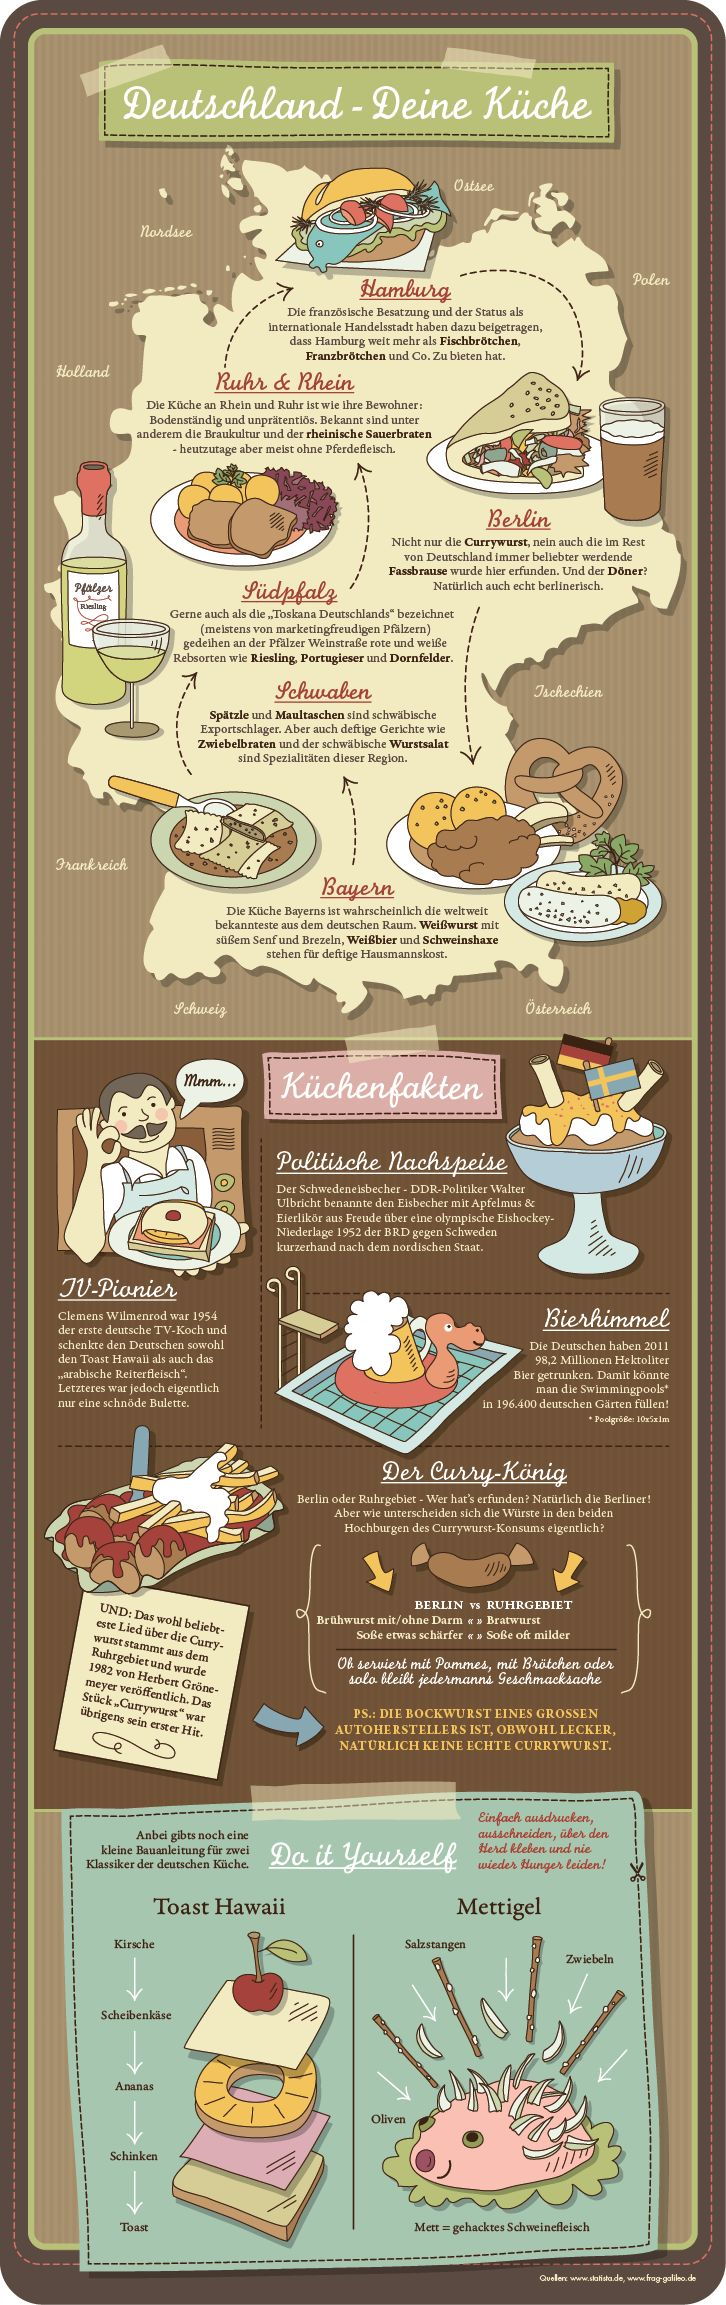 Infografía comida alemana